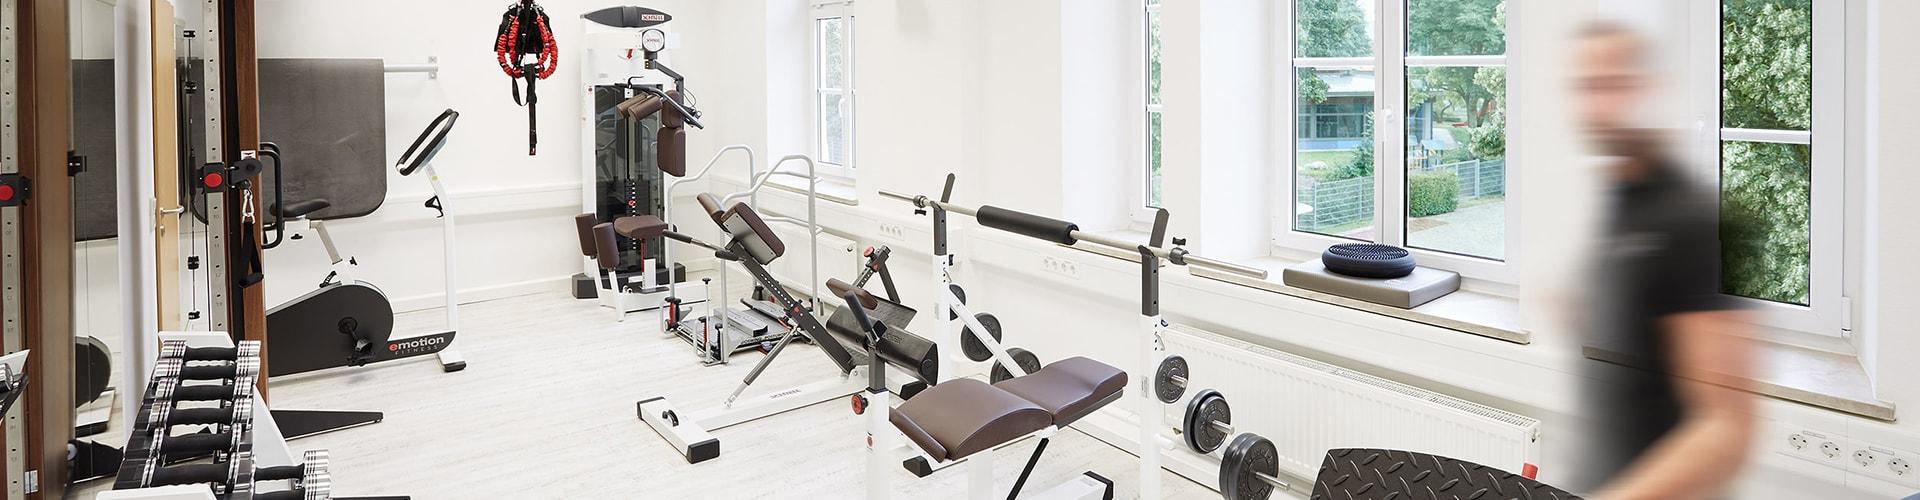 Praxis Physio Krankengymnastik Trainingsraum